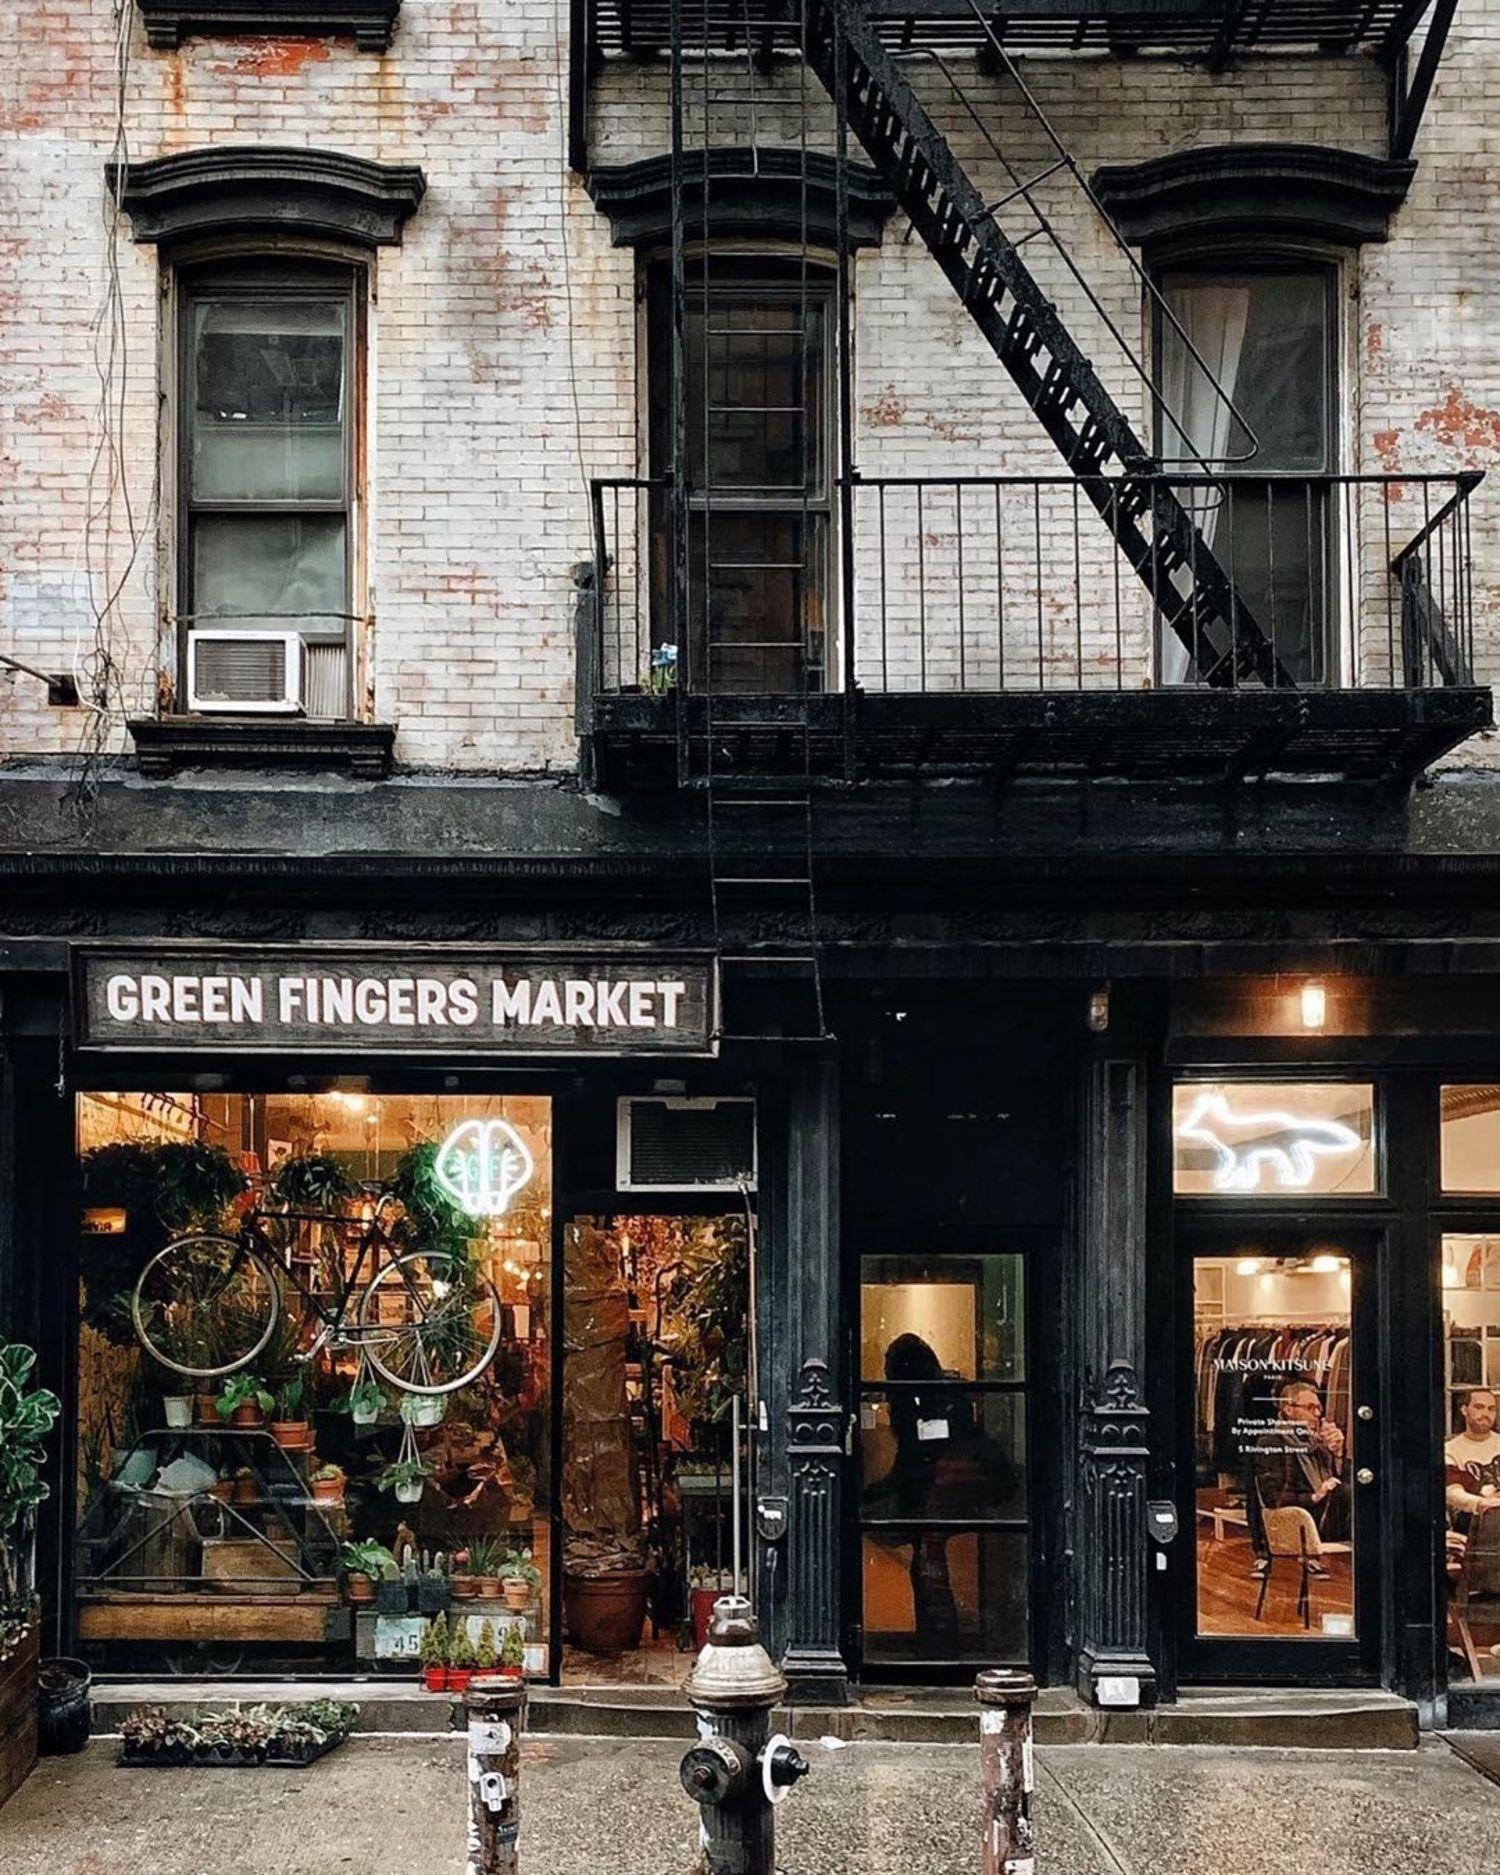 Lowed East Side, Manhattan. Photo via @heydavina #viewingnyc #nyc #newyork #newyorkcity